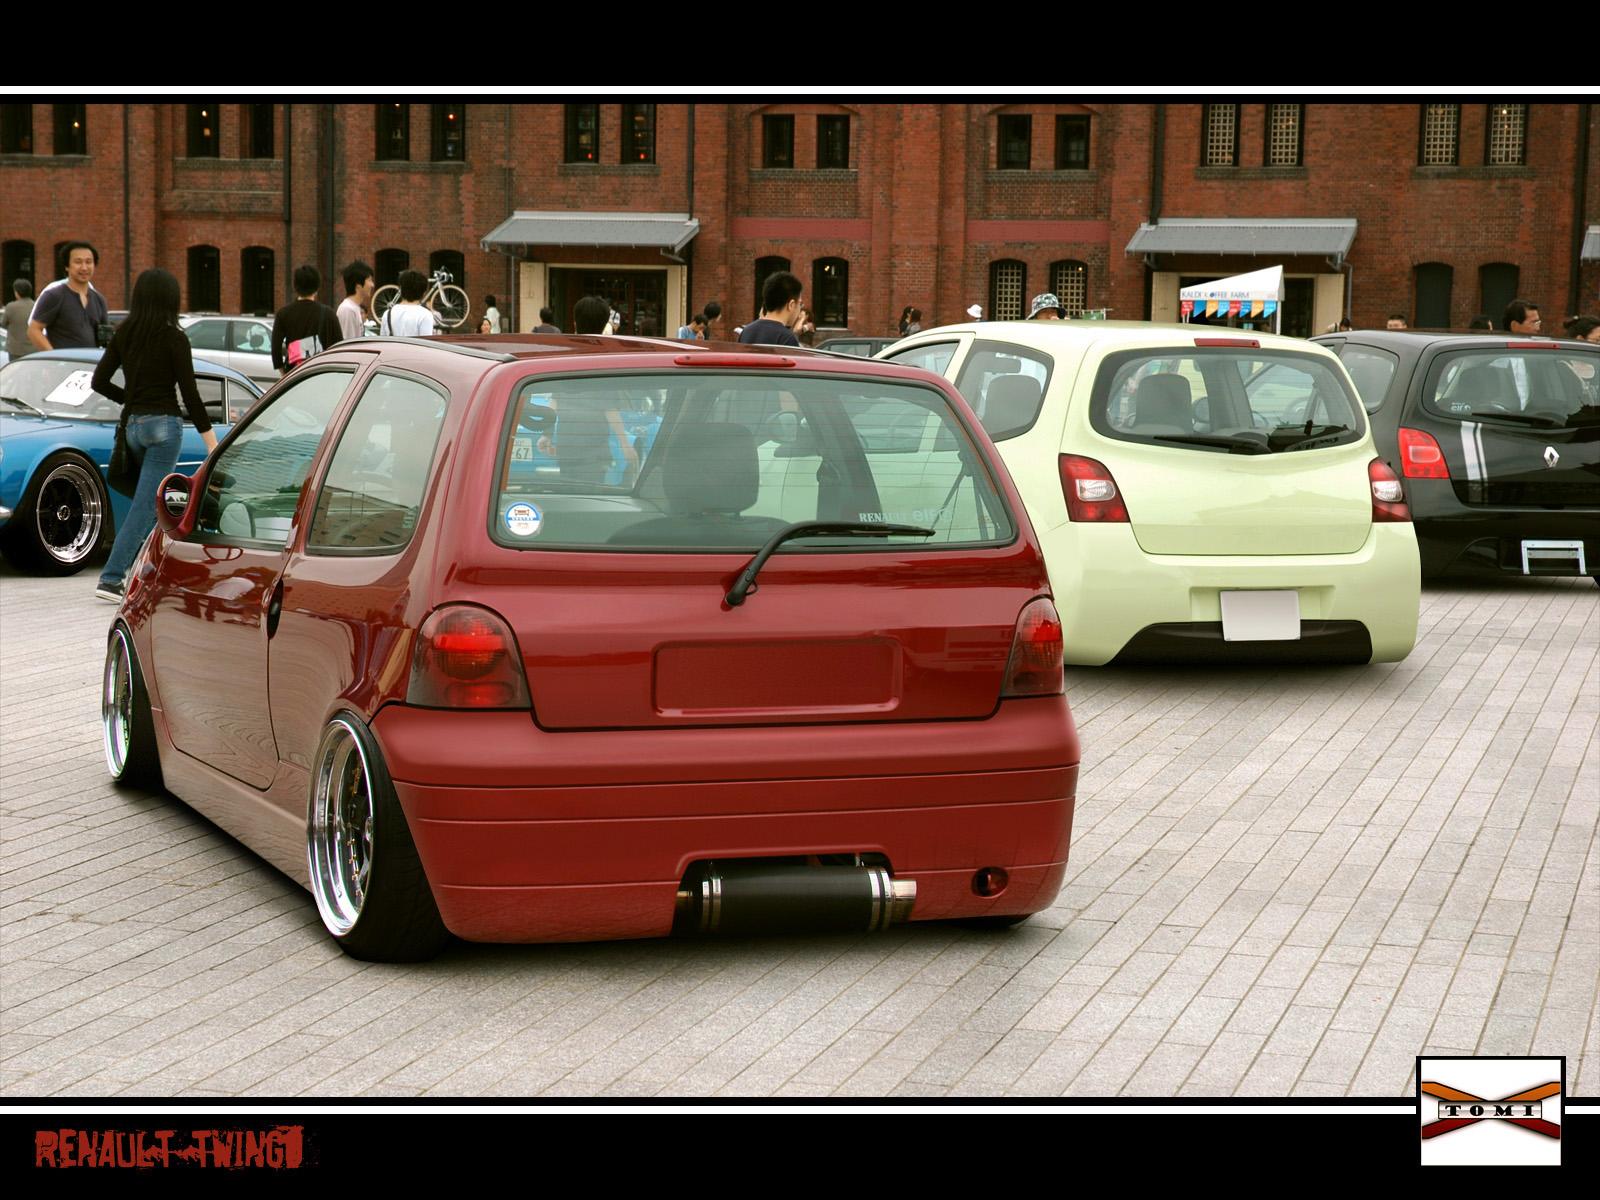 Renault Twingo Group M C A Solata